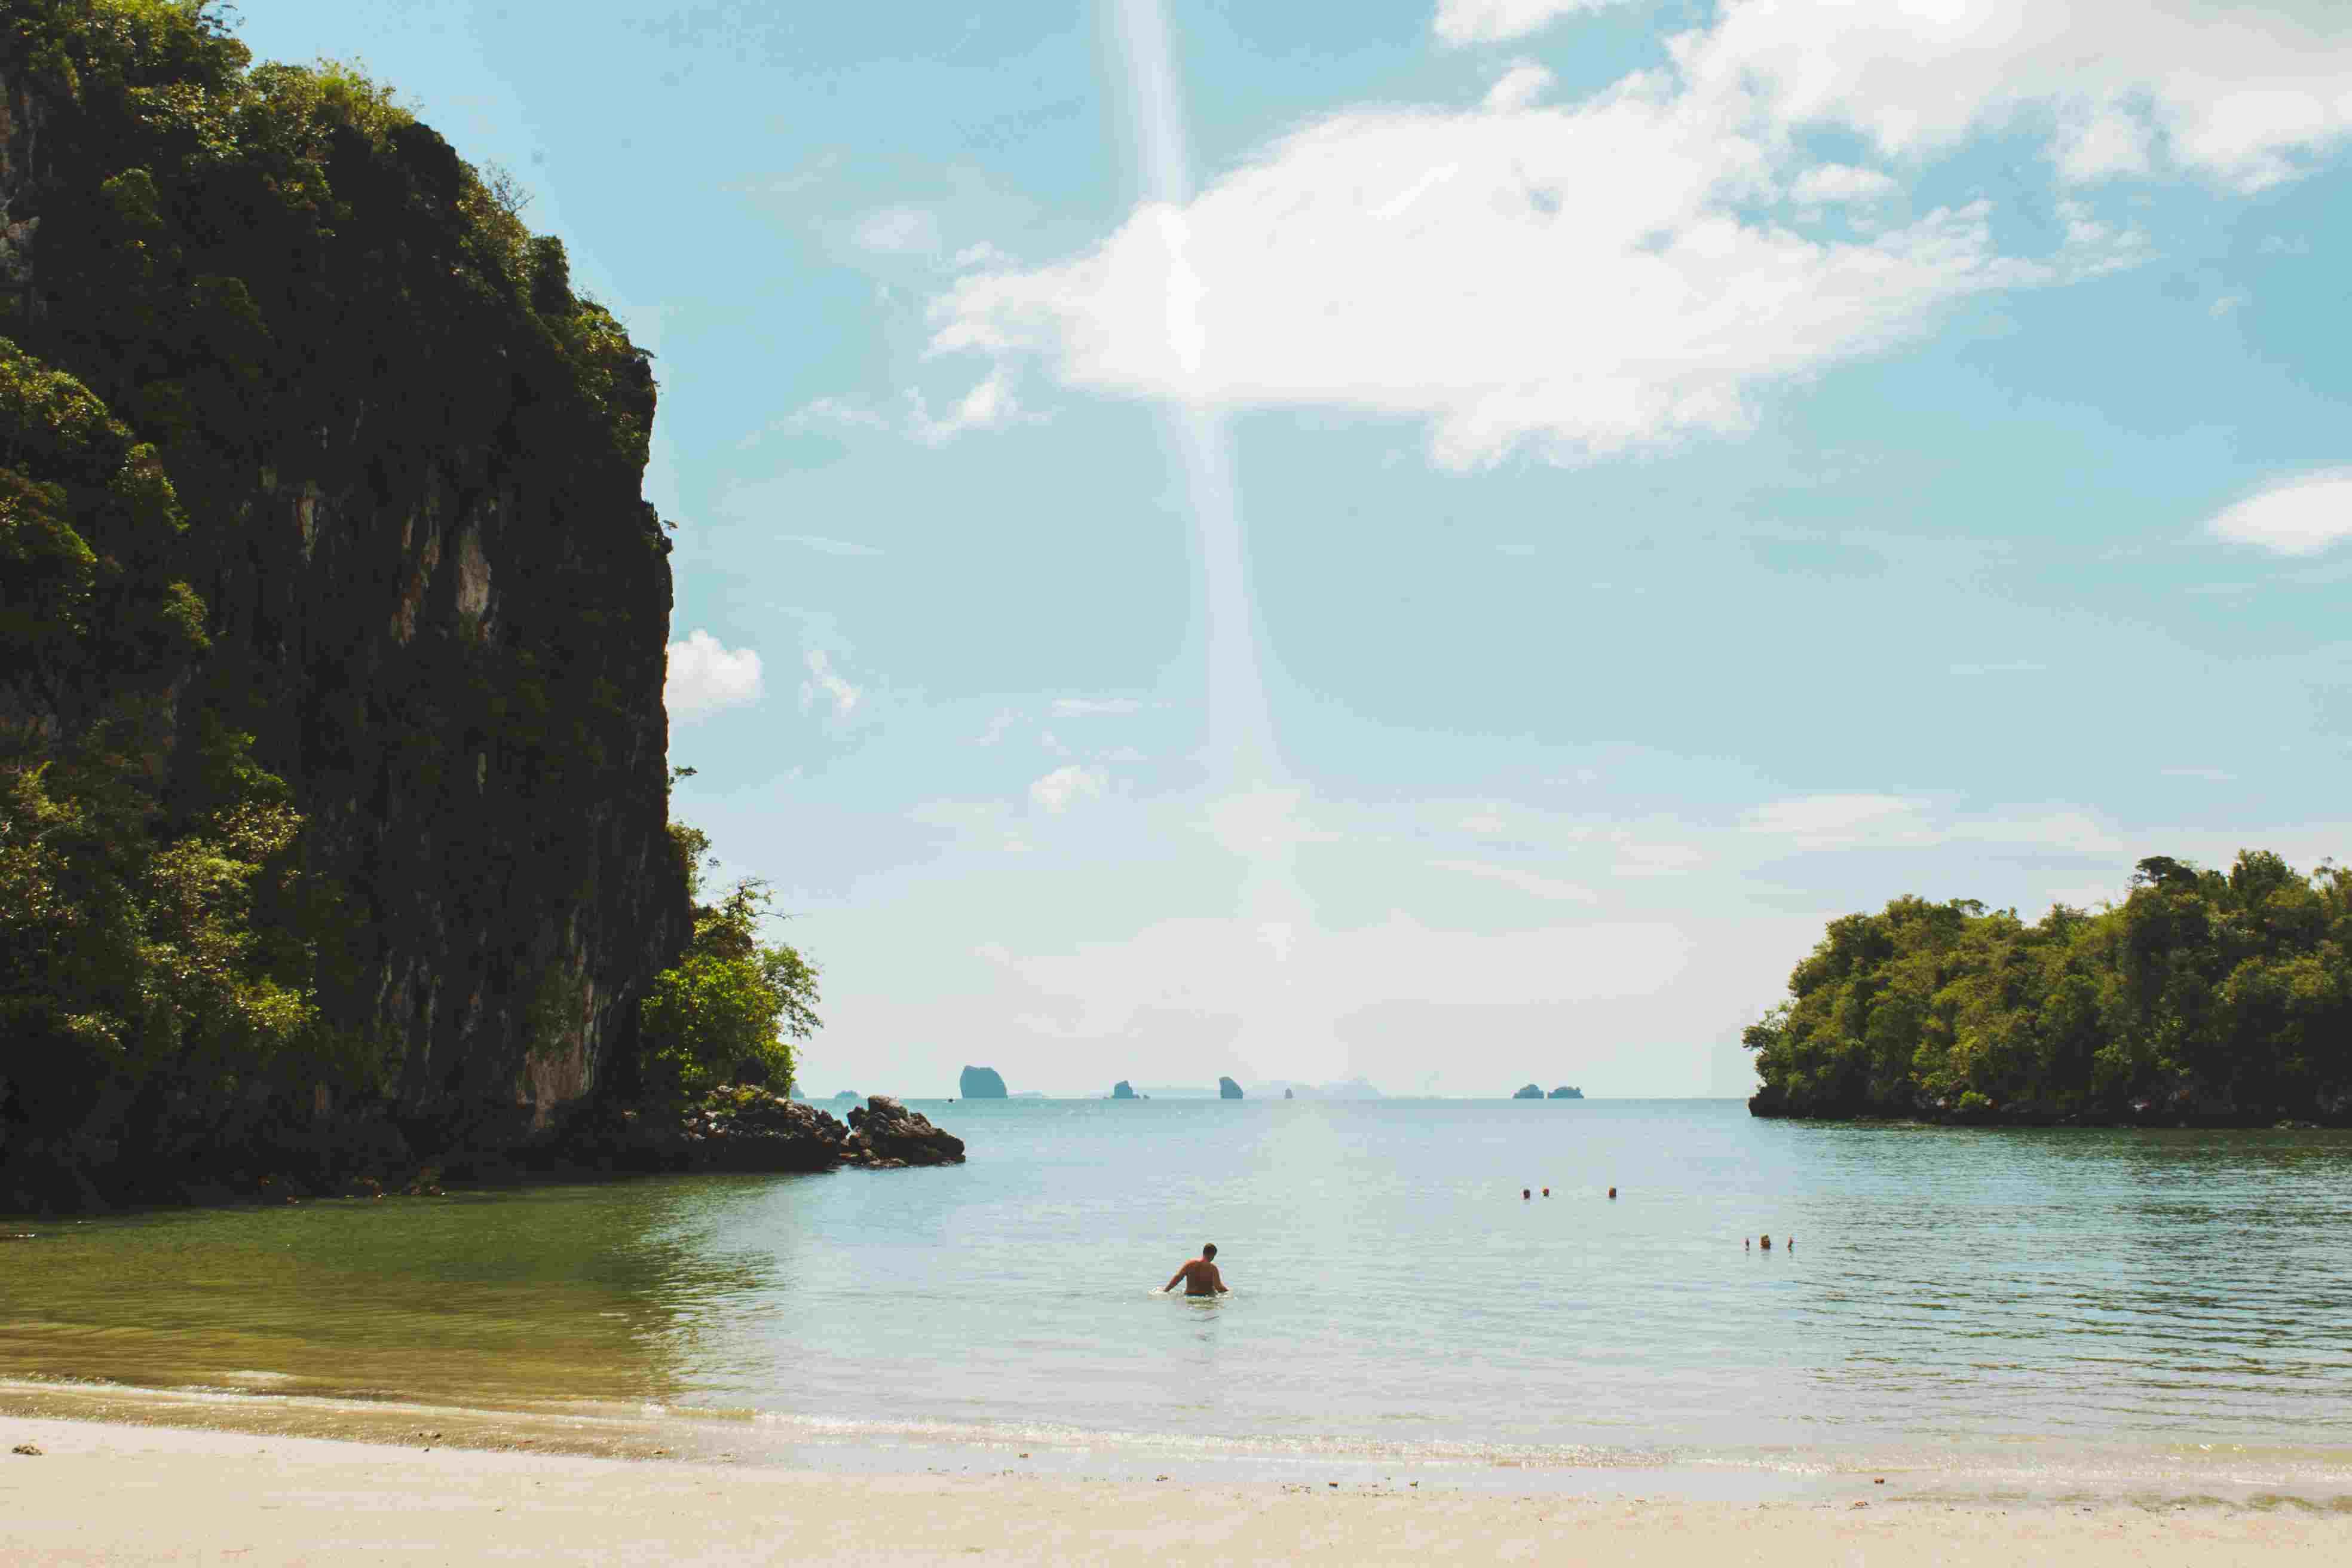 a man swimming in a lagoon in Krabi, Thailand